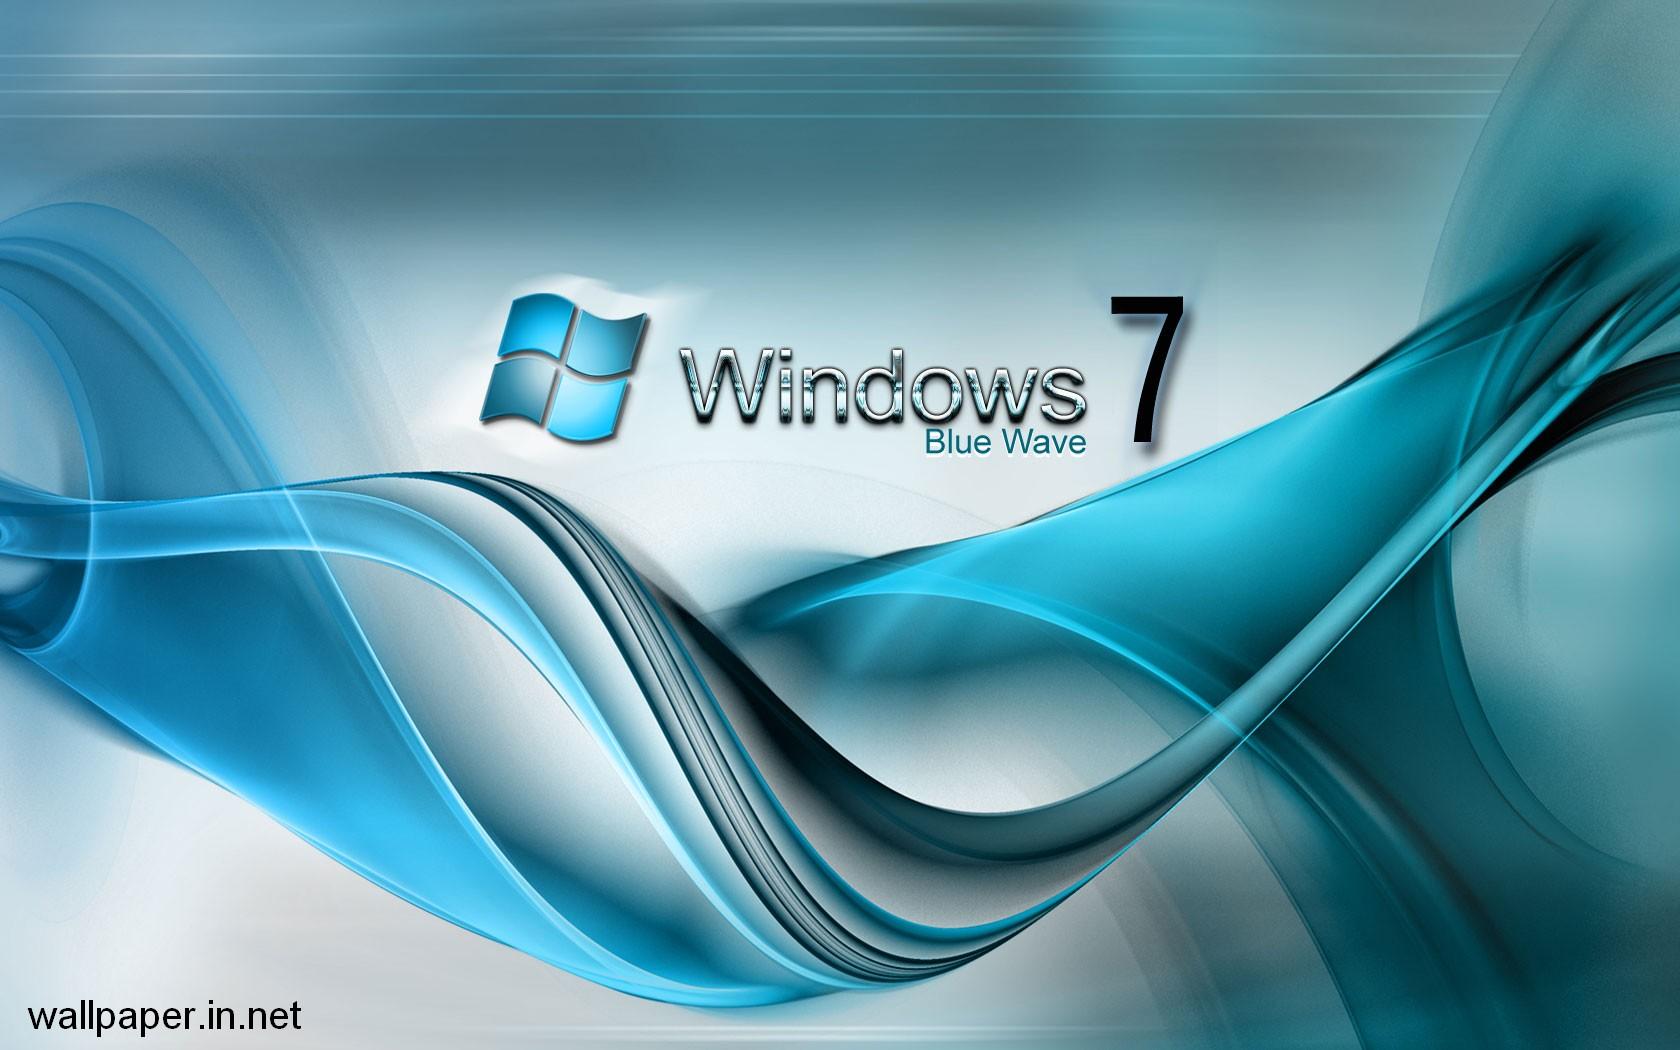 Windows Wallpaper Hd Download Cute Wallpapers